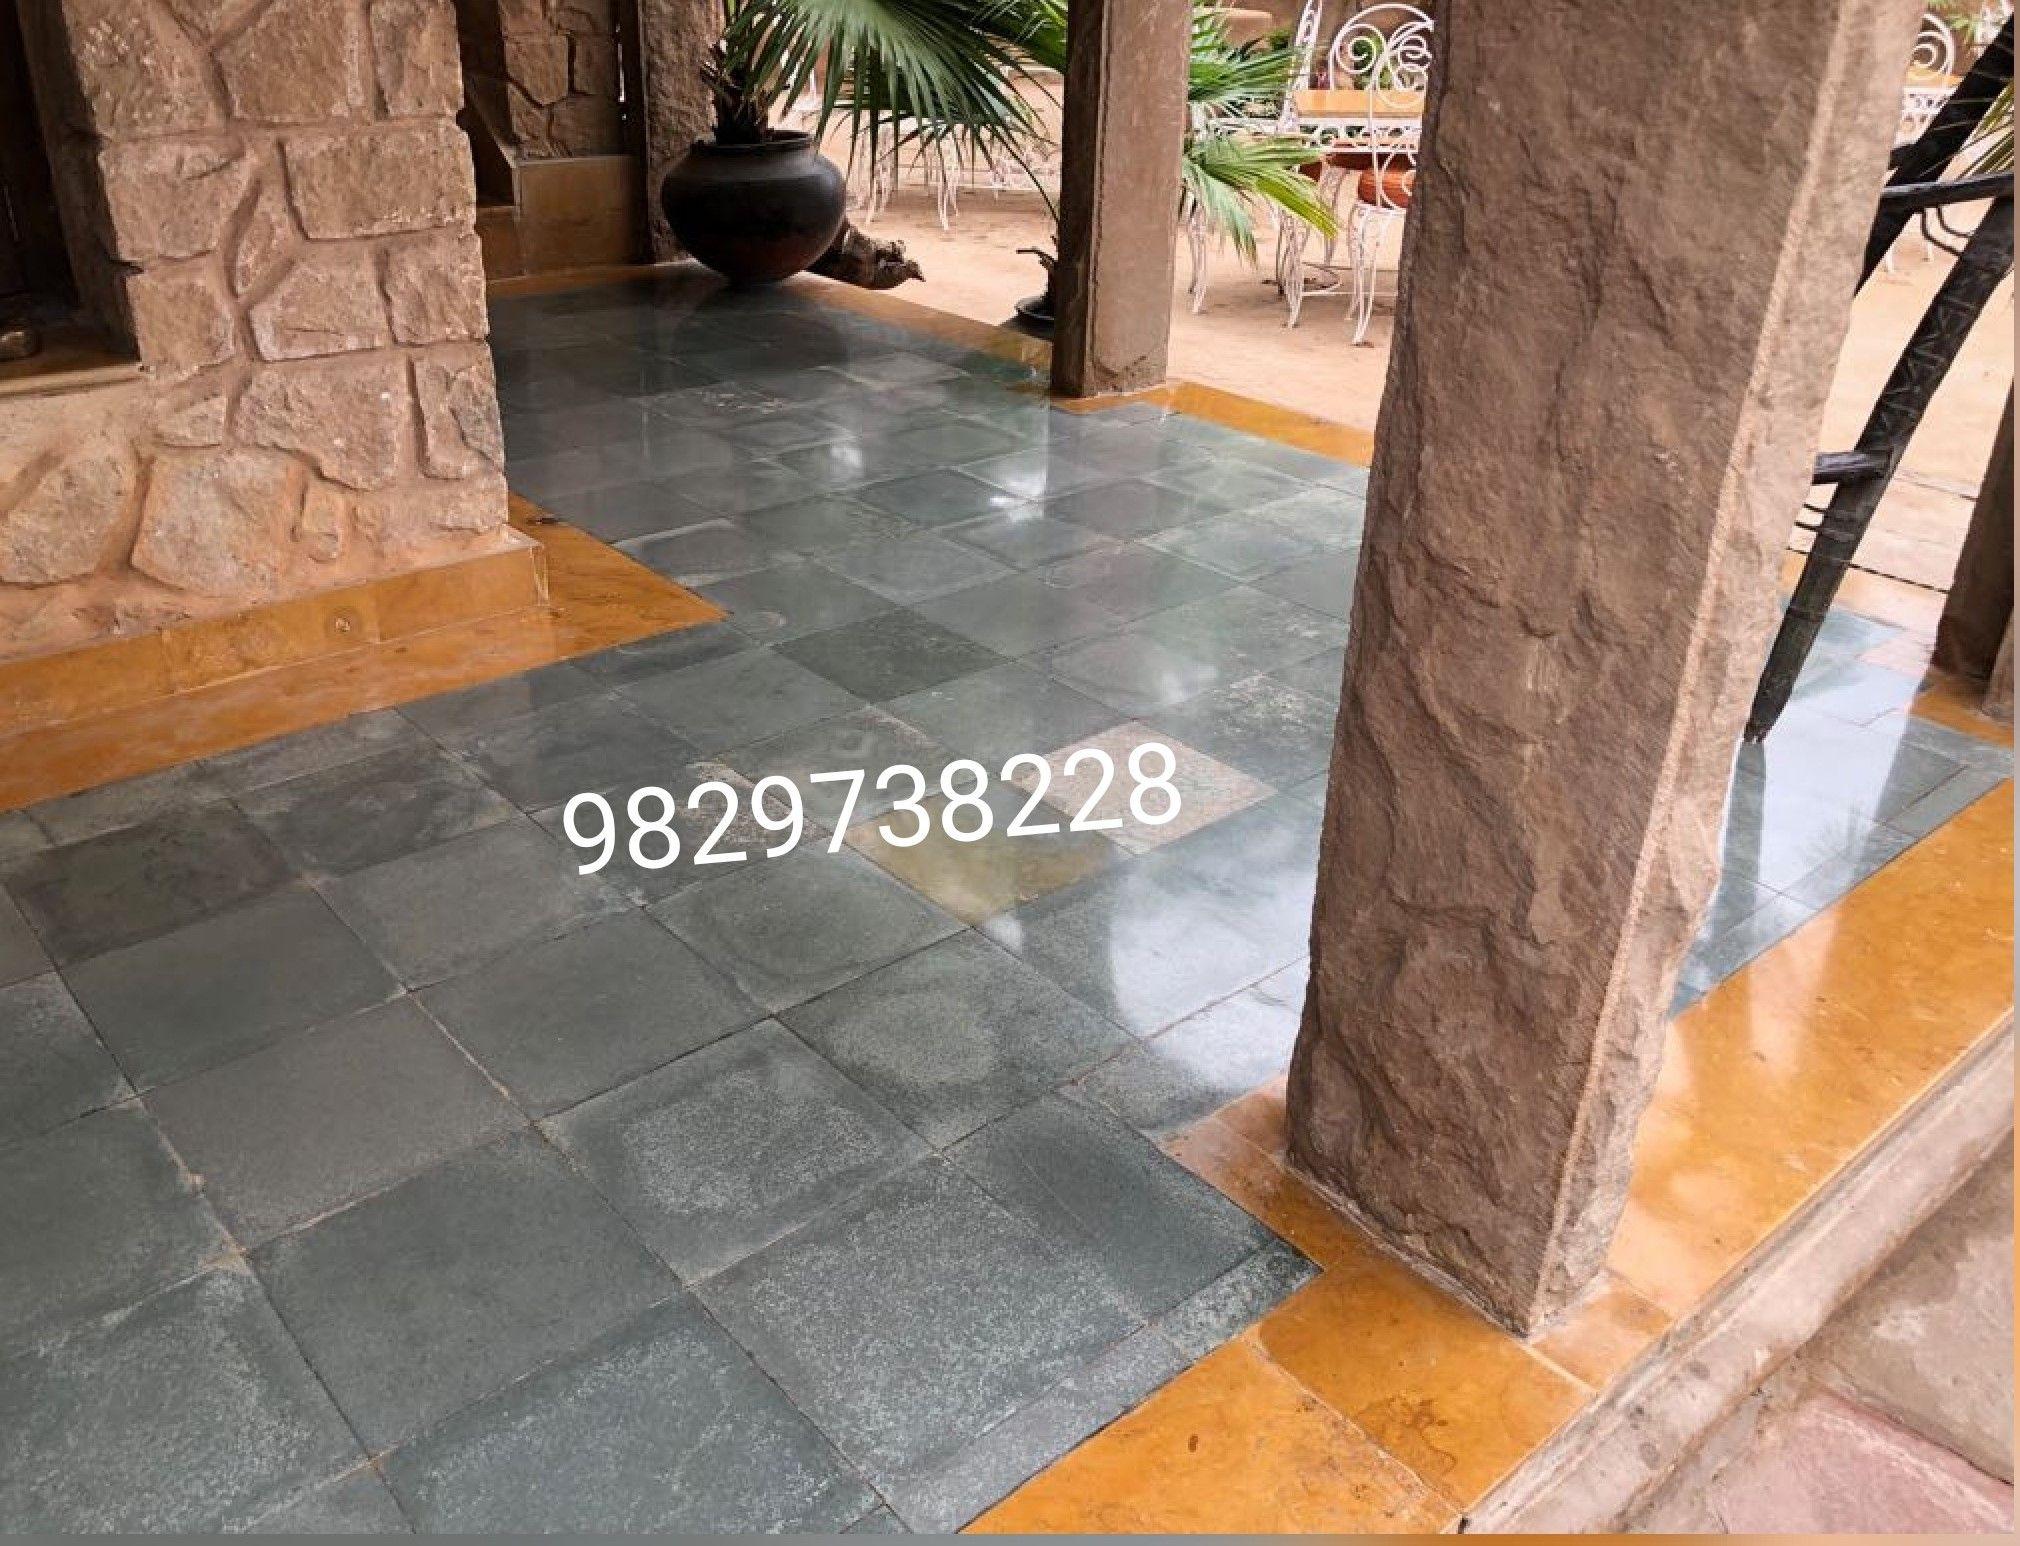 Kota Stone flooring color, pattern, designs,looking ...